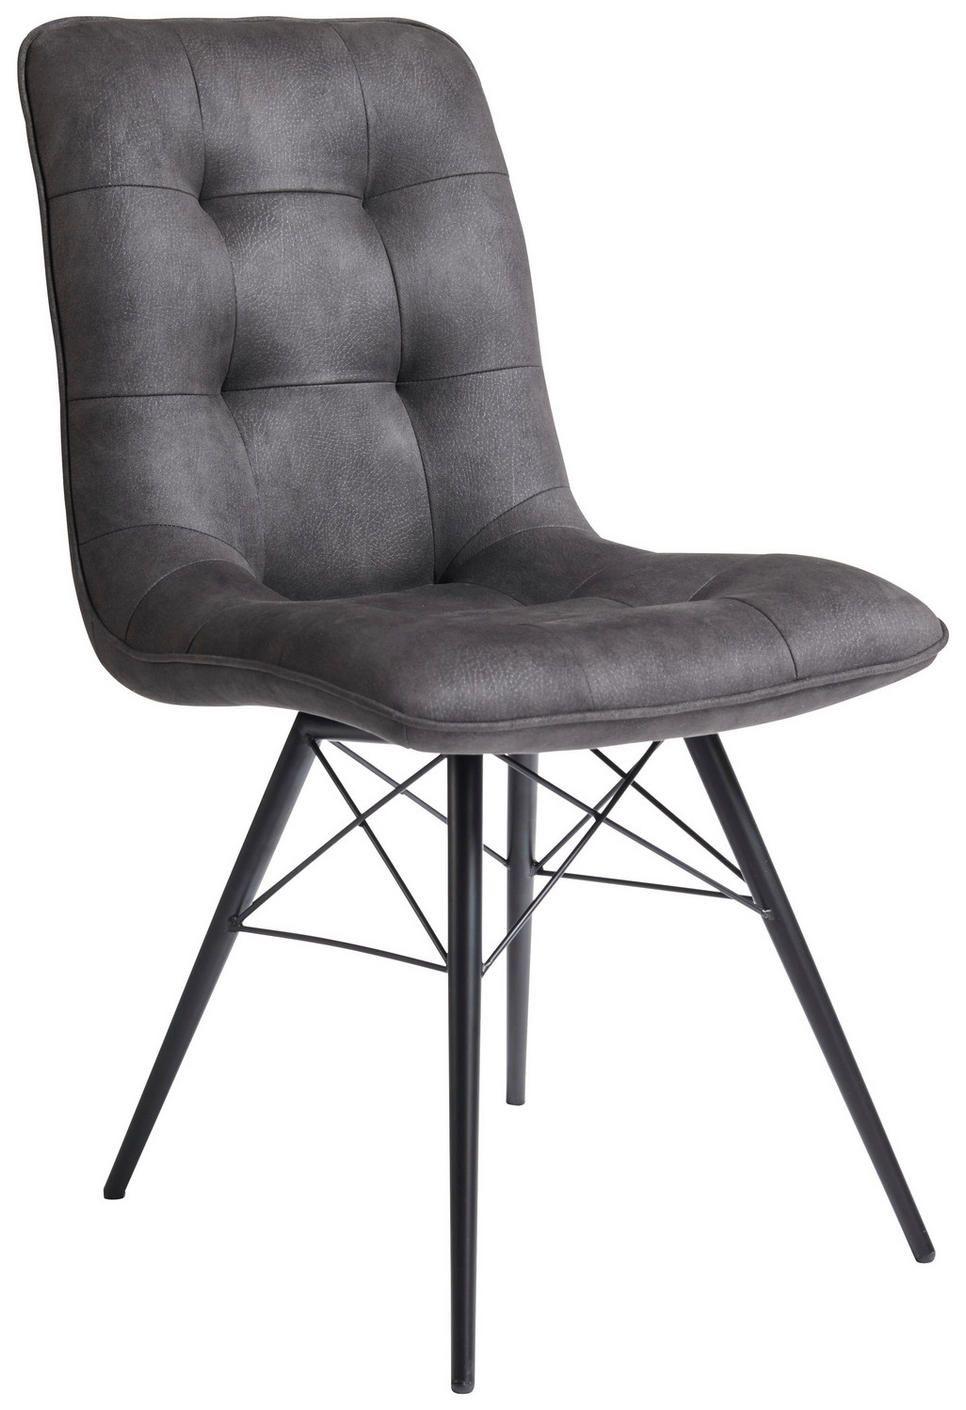 Stuhl Mikrofaser Eukalyptusholz Sperrholz Schwarz Dunkelgrau Esszimmerstuhle Stuhle Grauer Stuhl